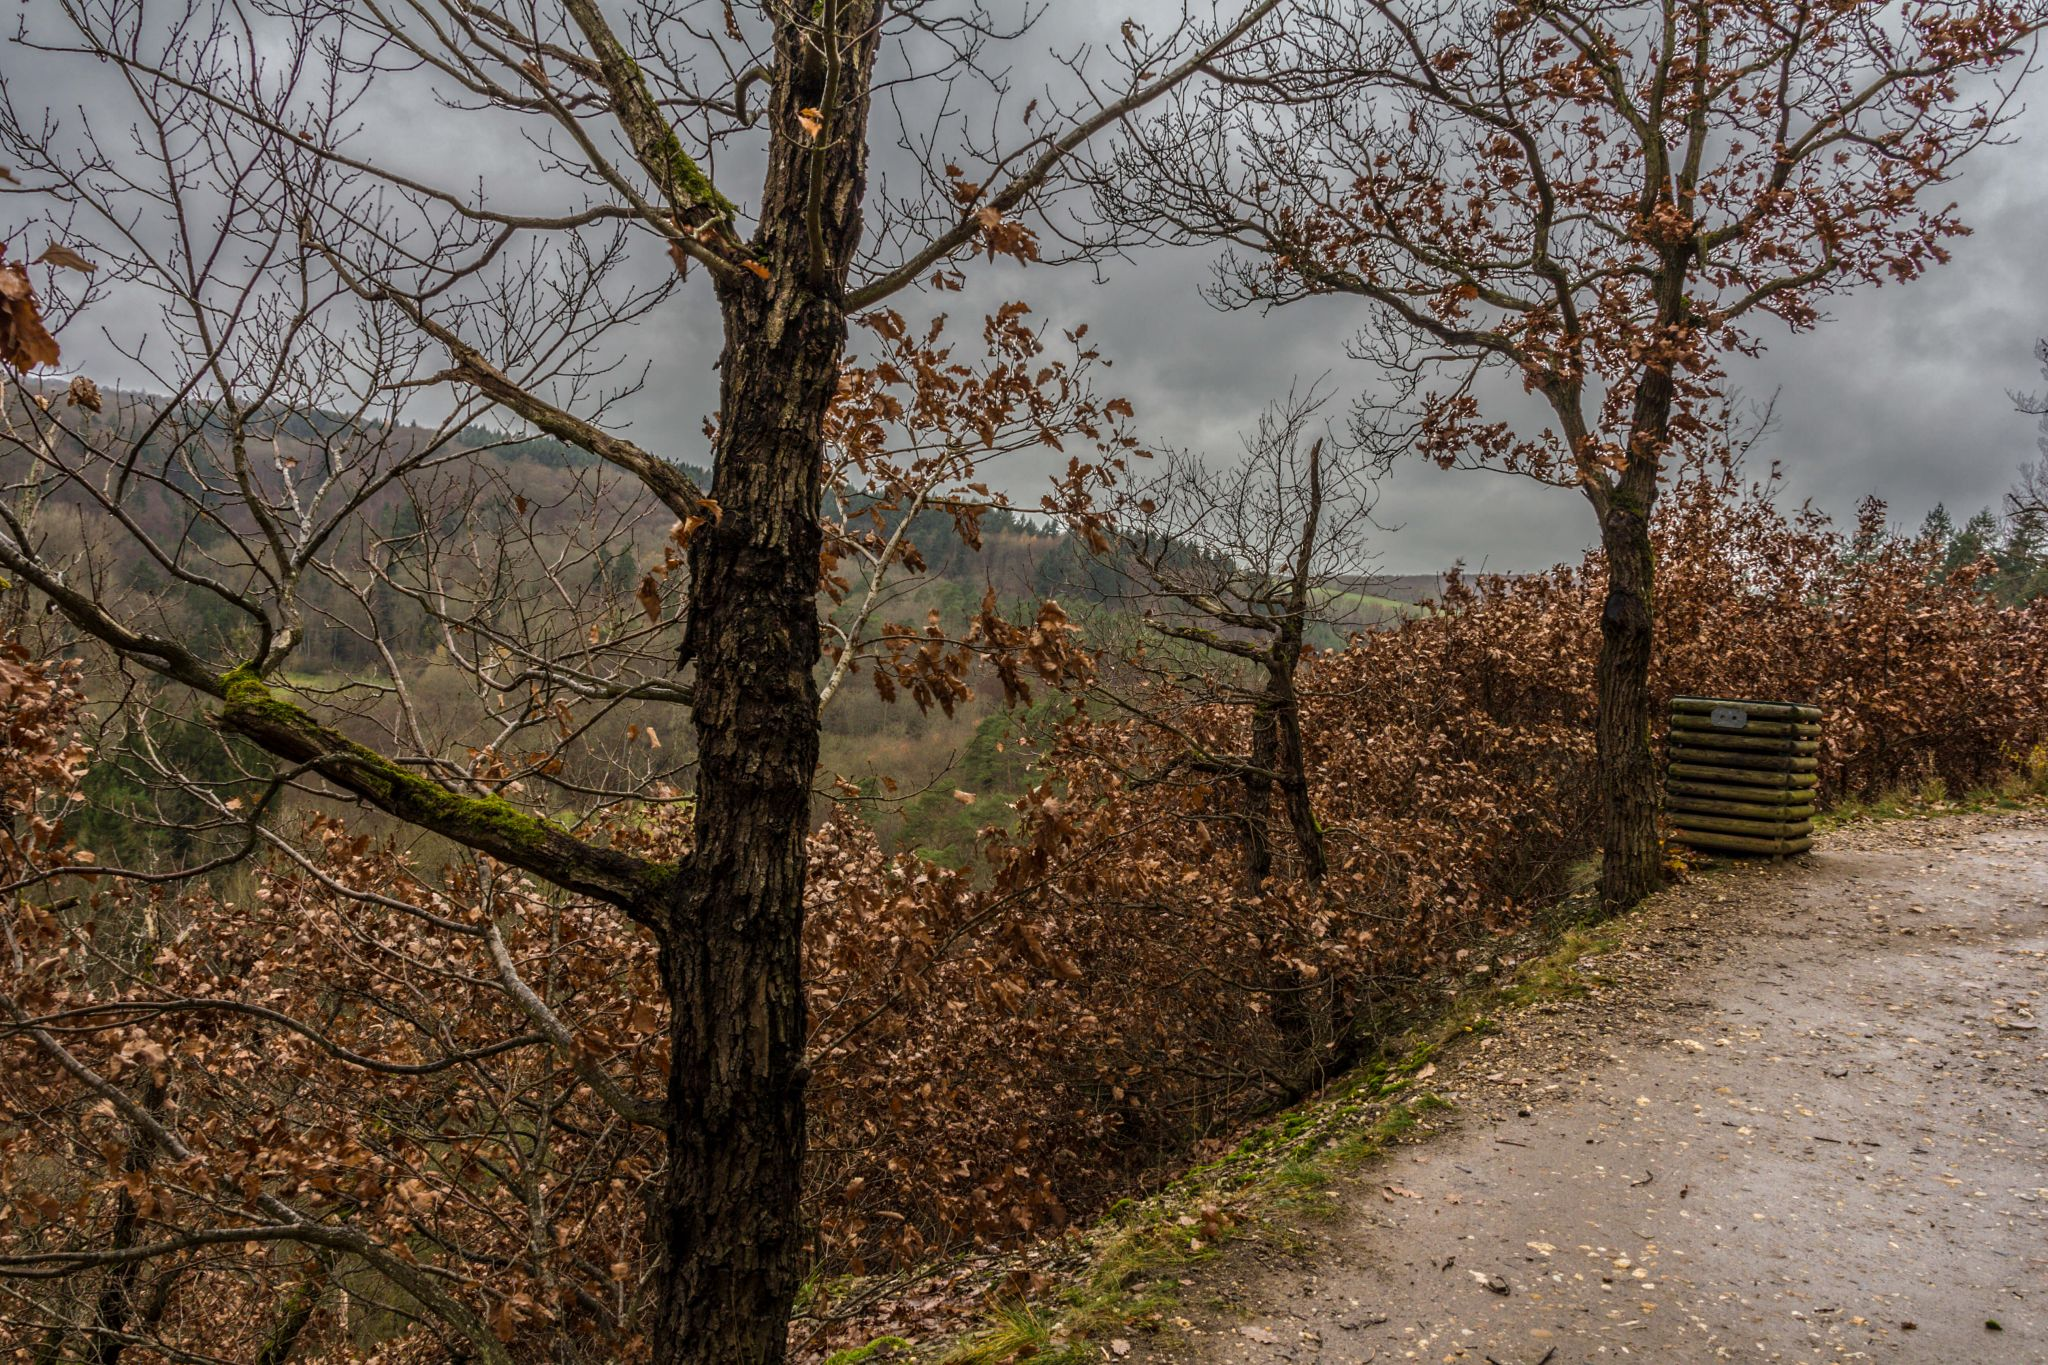 View over Wierschemer Bach valley, Germany